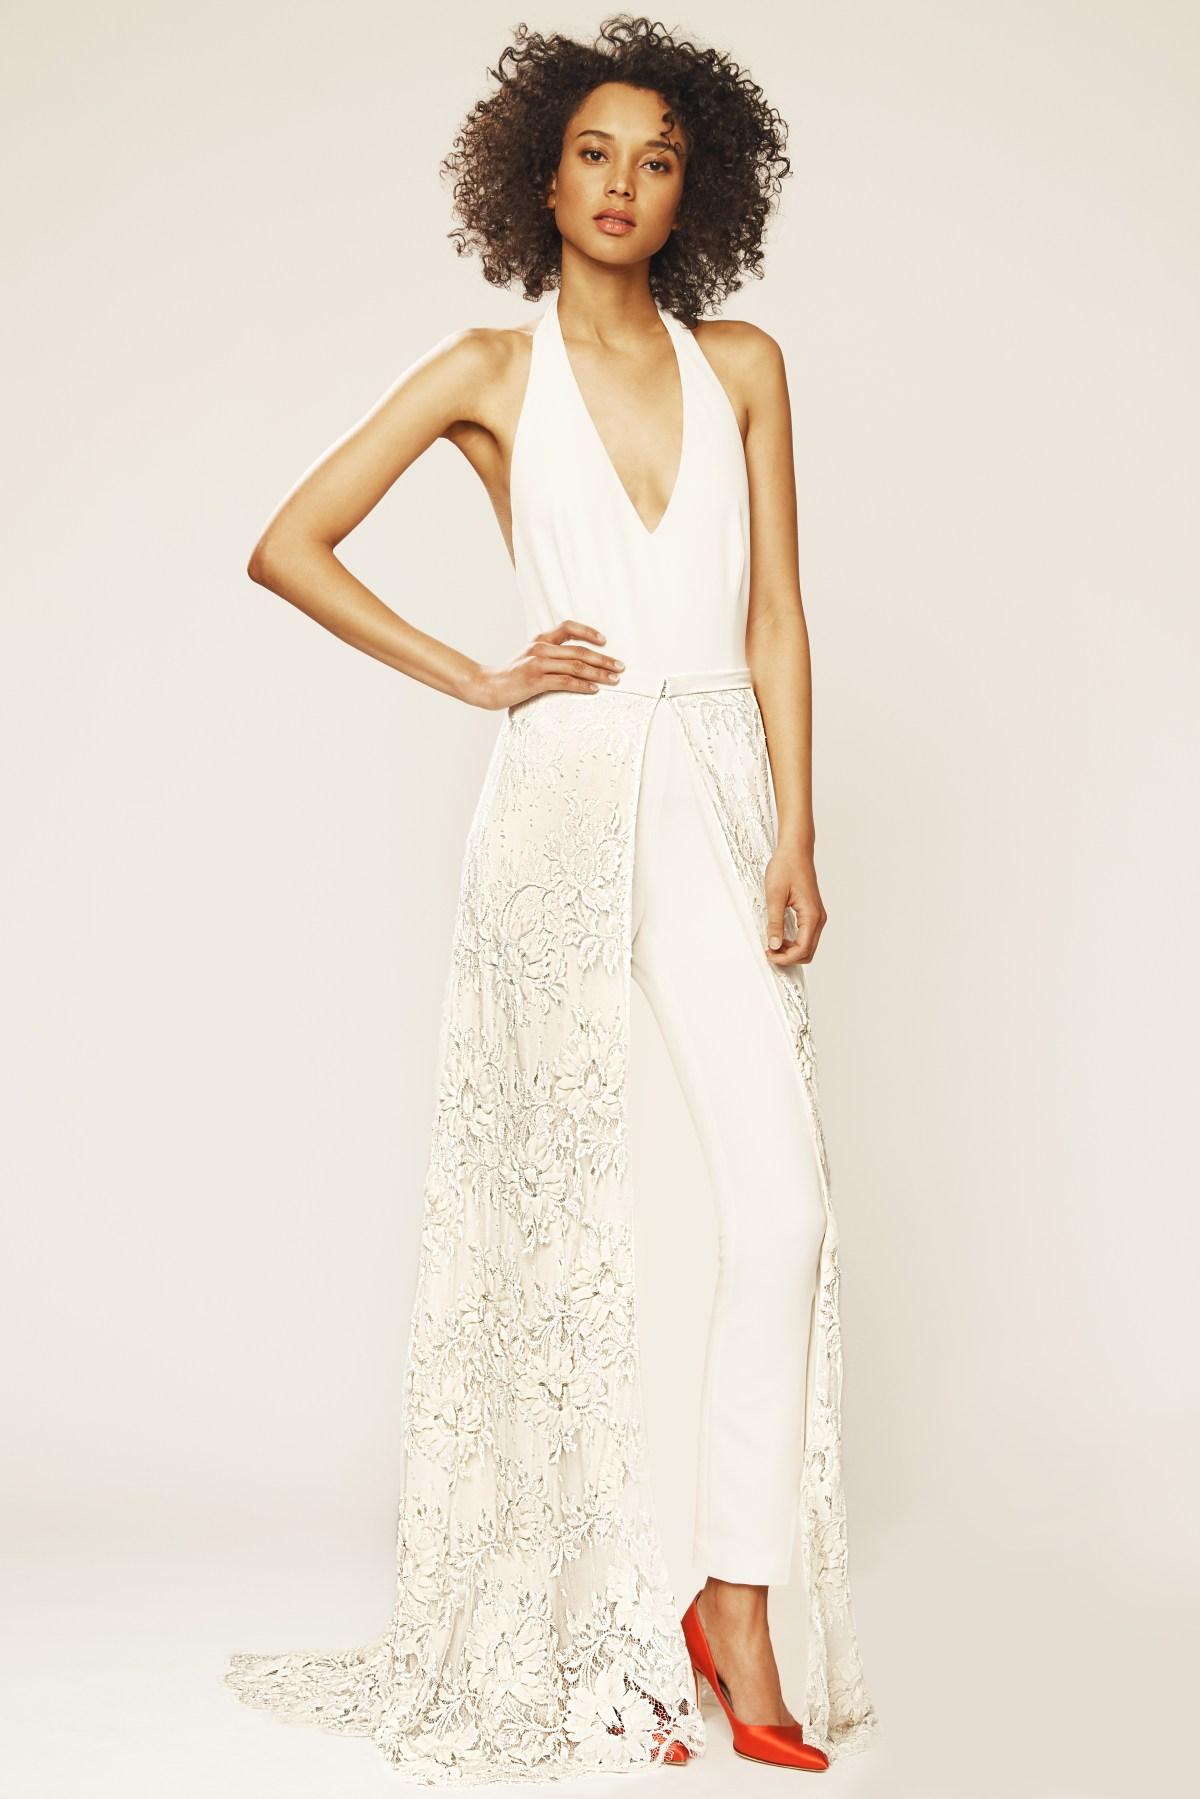 The Wedding Dress Mistake I Made On Purpose